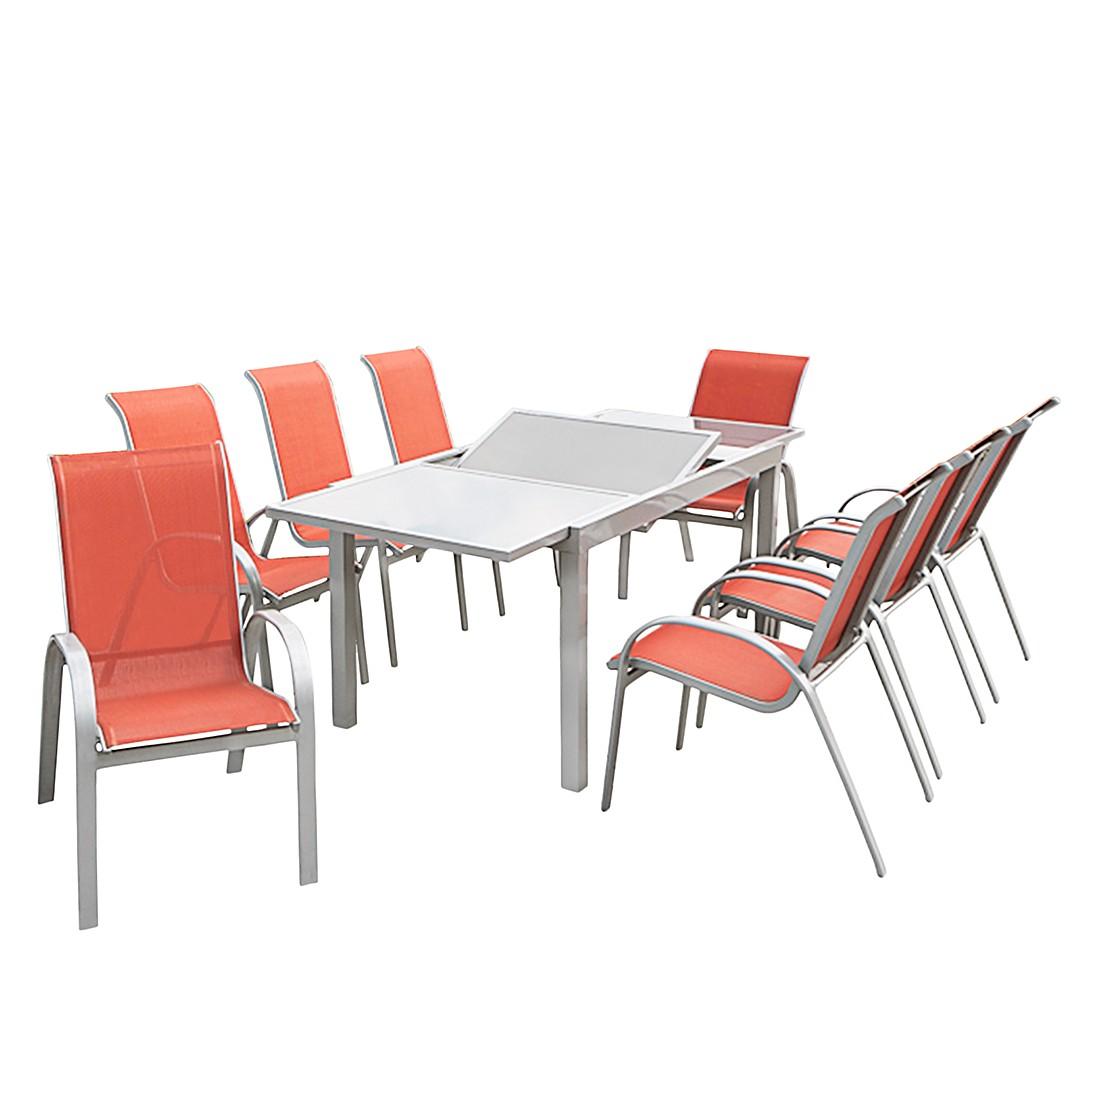 Gartensitzgruppe Amalfi II (9-teilig) - Aluminium Silber/Kunstfasergewebe Terracotta, Merxx